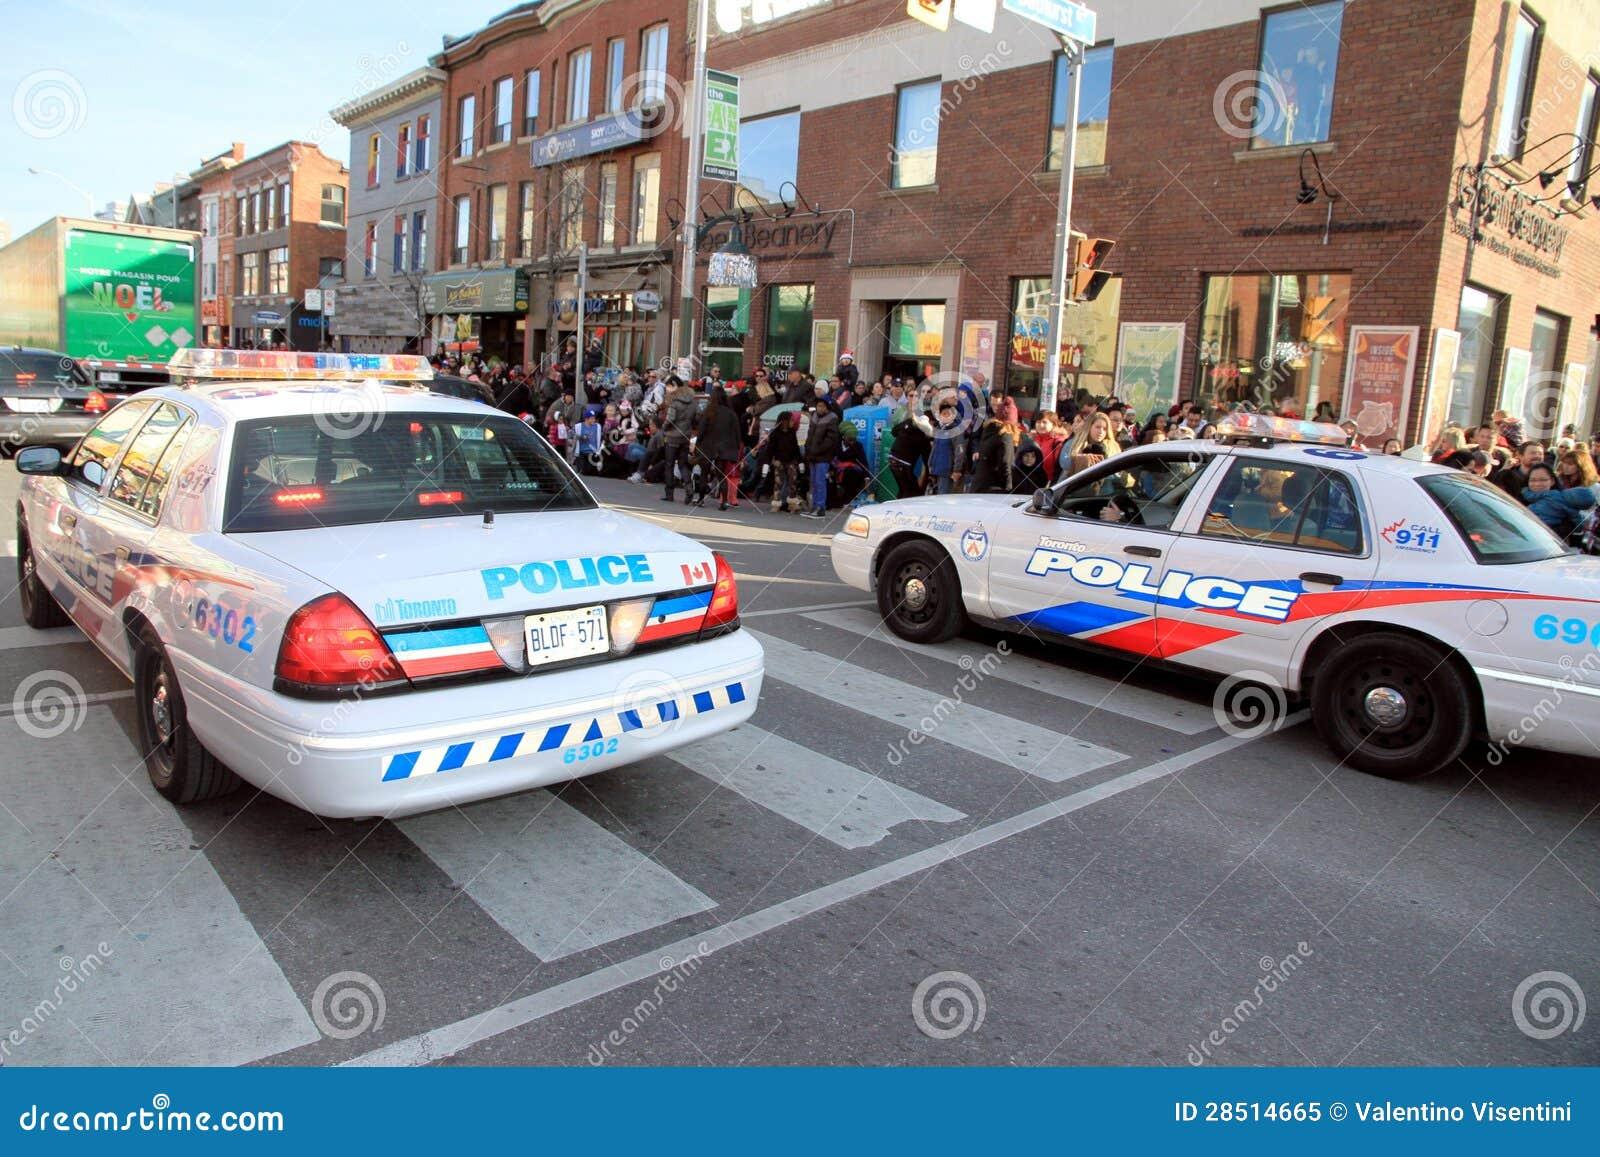 Toronto Police Cars